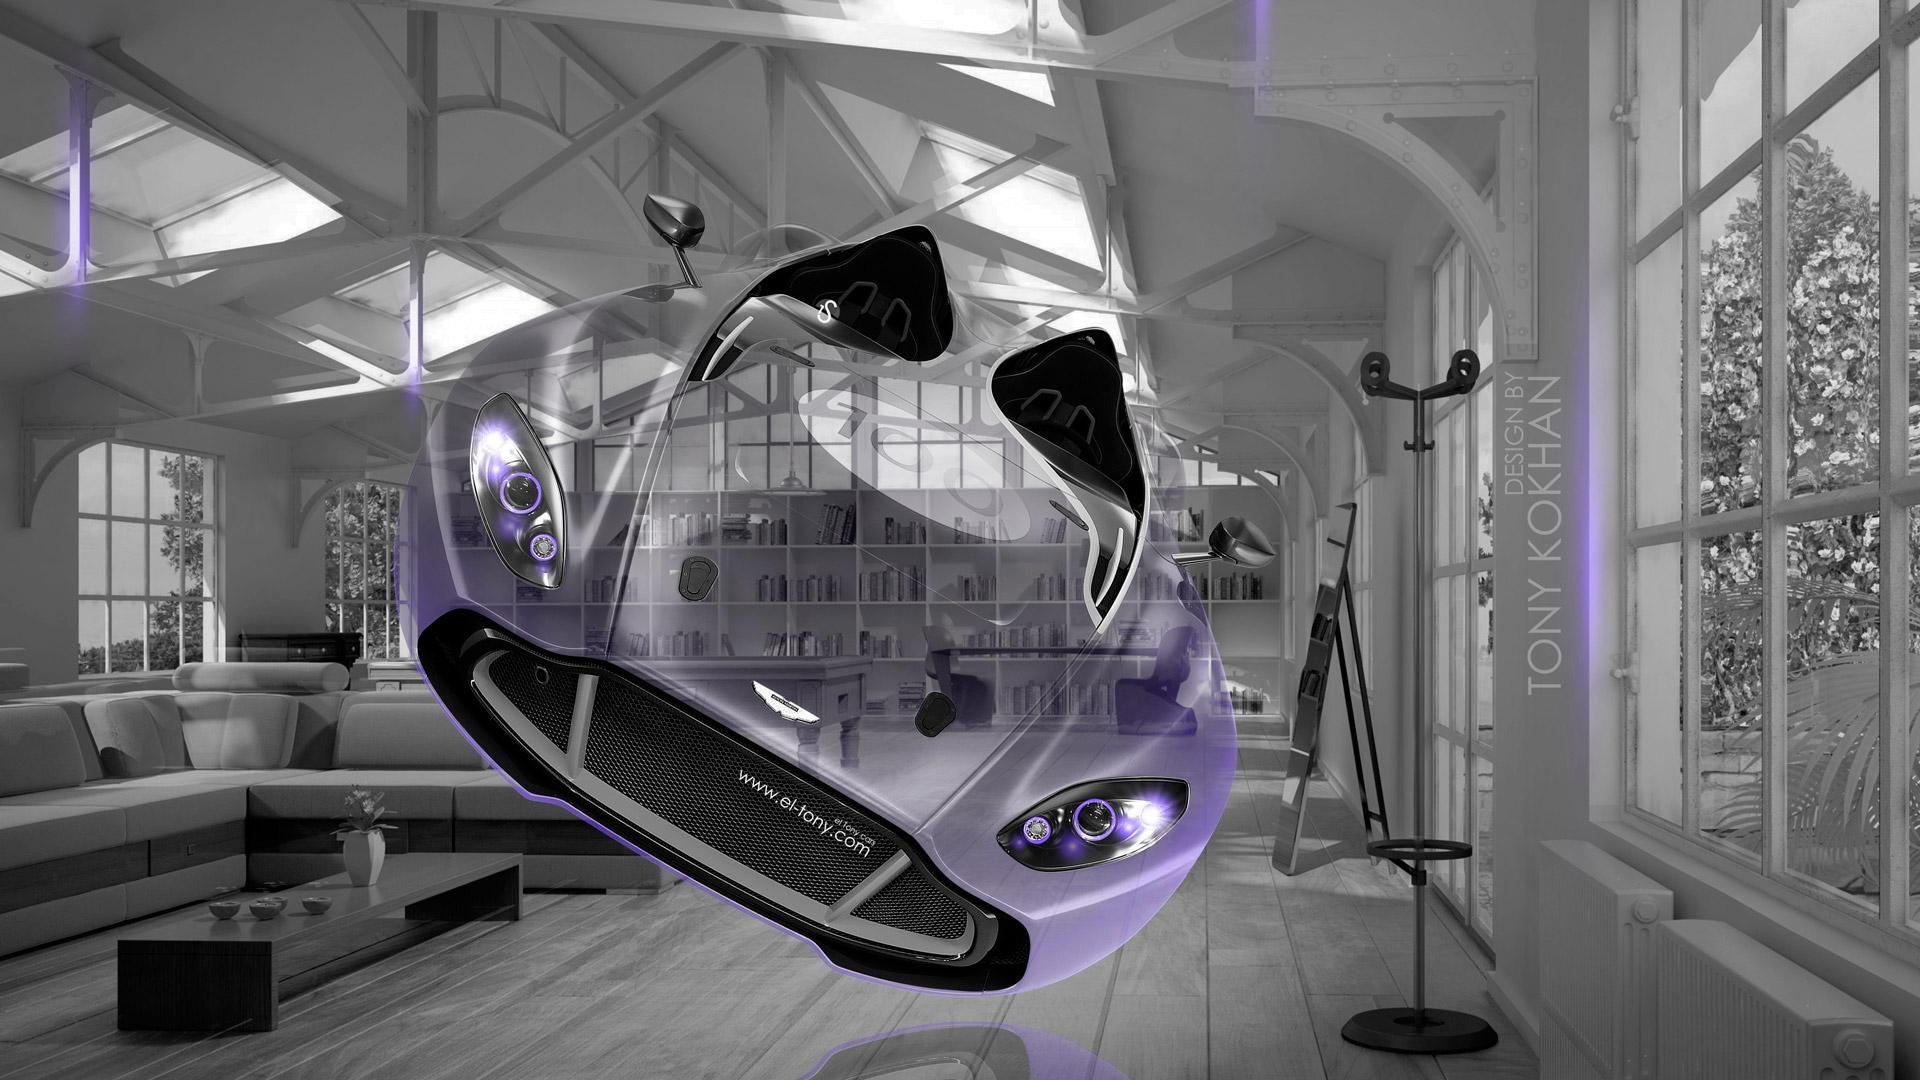 Aston Martin CC100 Fantasy Crystal Home Fly Car 2014 Violet Neon HD 1920x1080